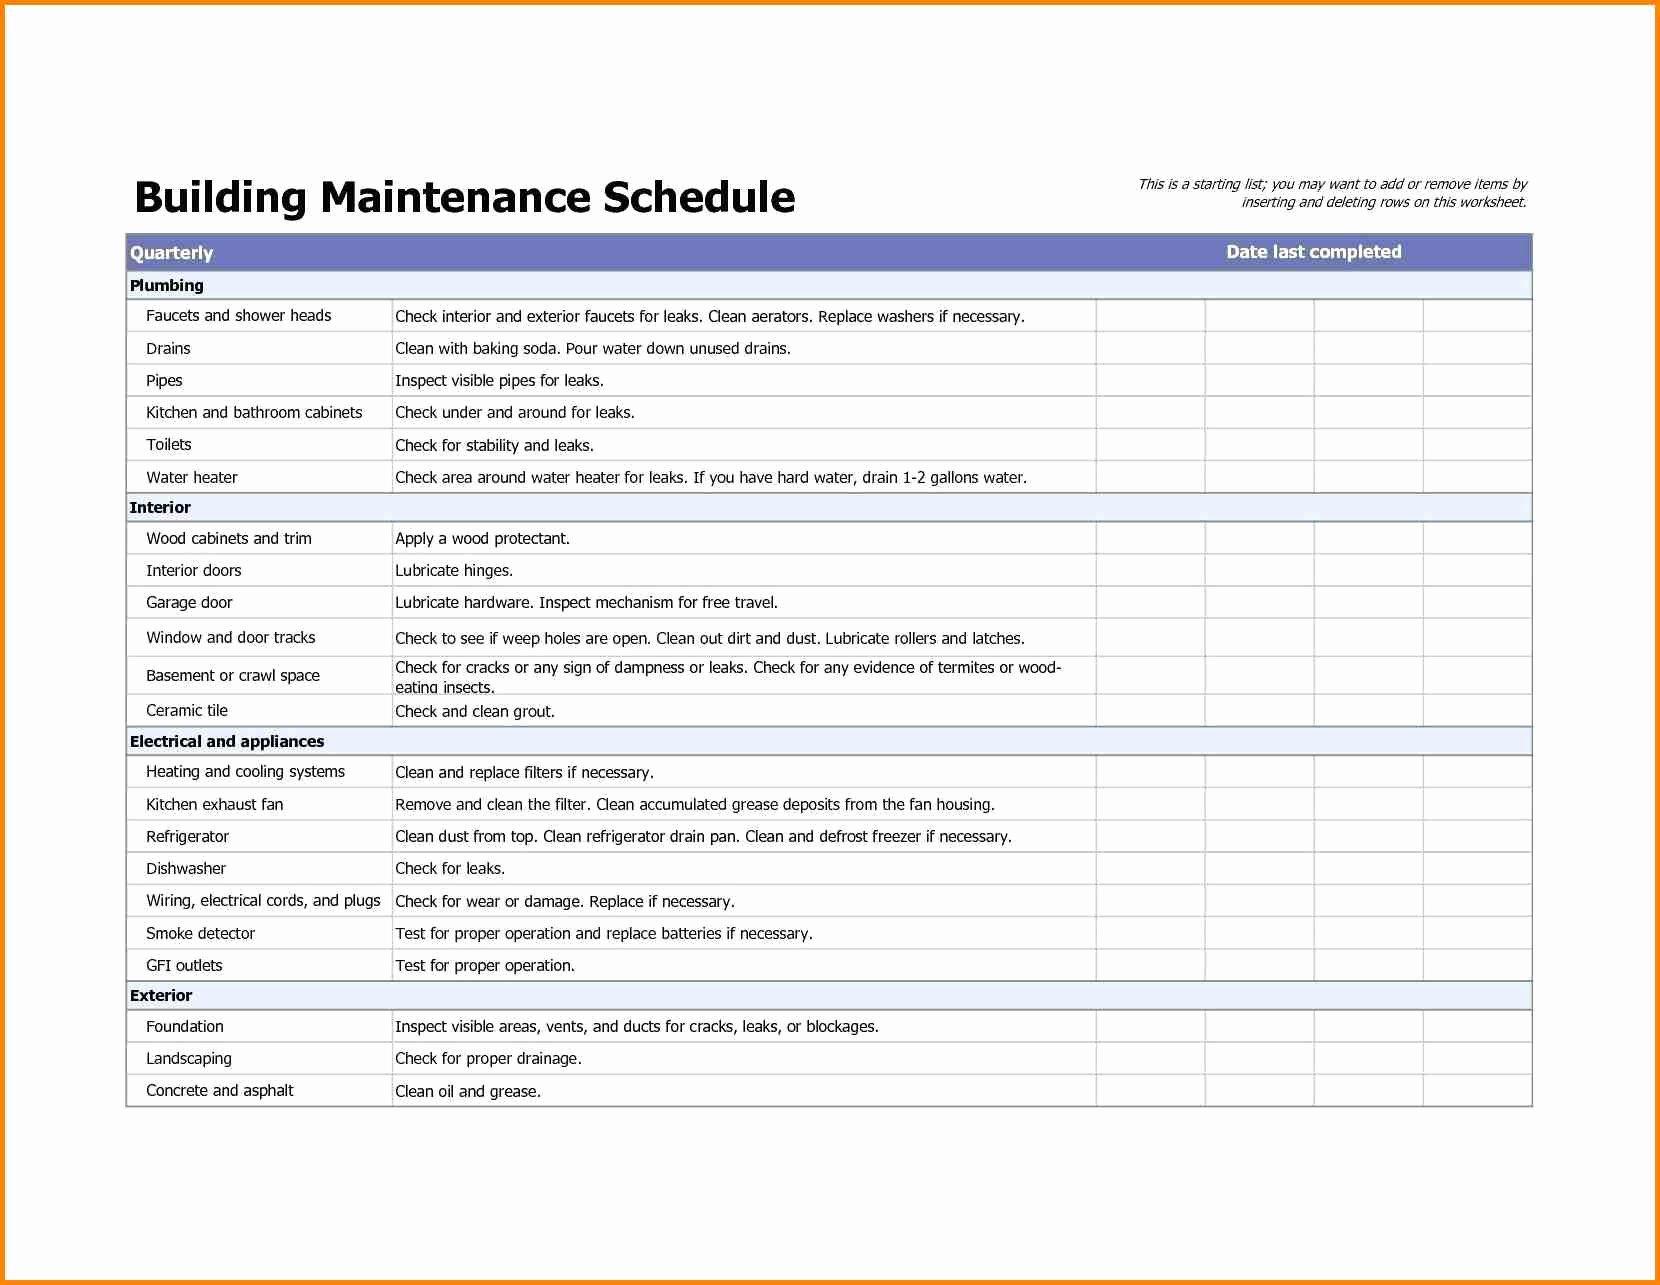 Preventative Maintenance Checklist Template New Building Maintenance Checklists – Emmamcintyrephotography